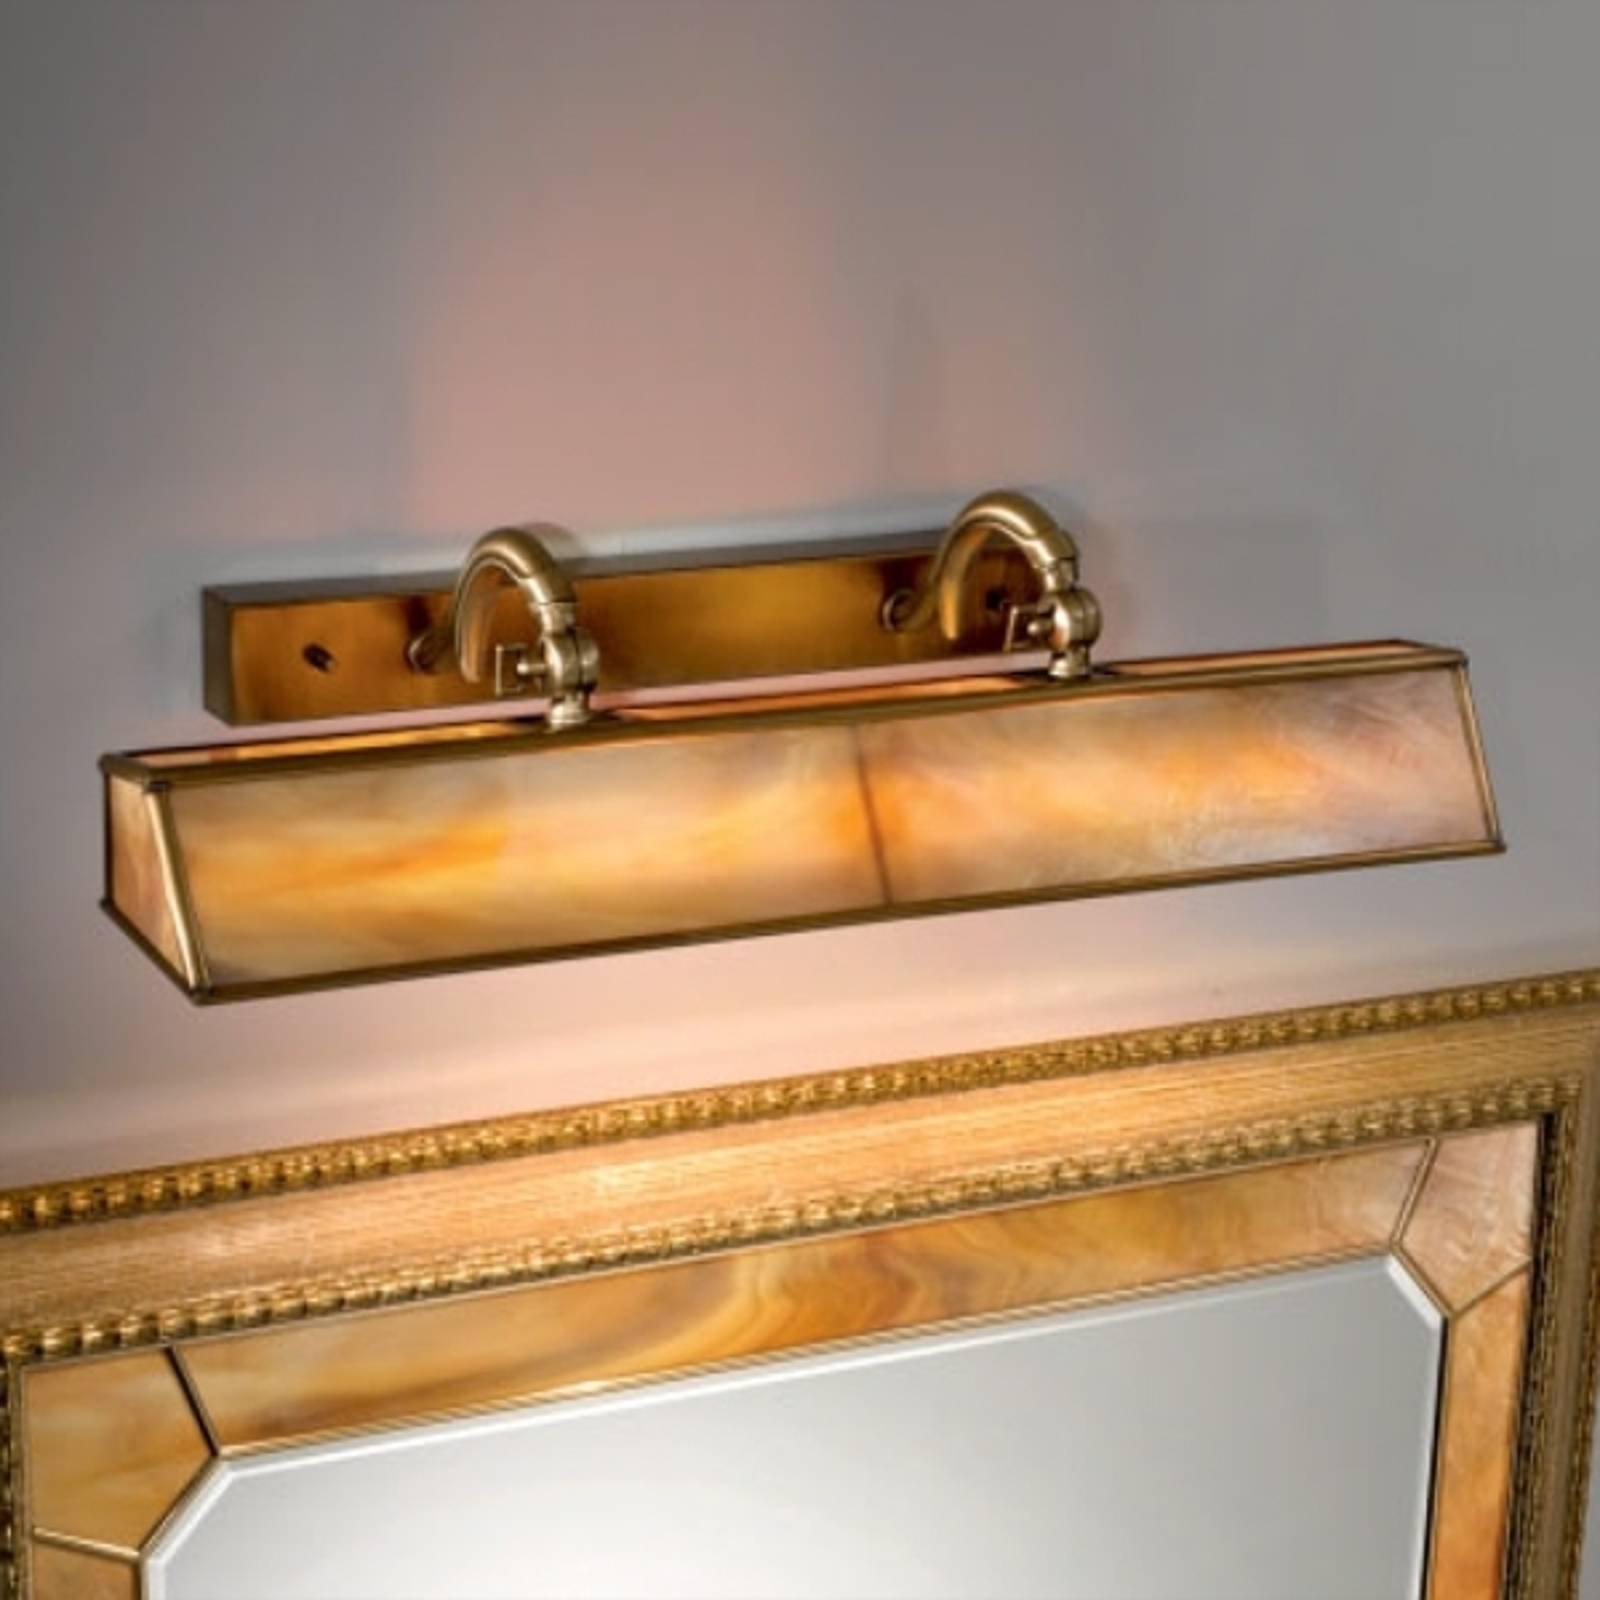 Klassisk Galleria bildebelysning i ambra/messing